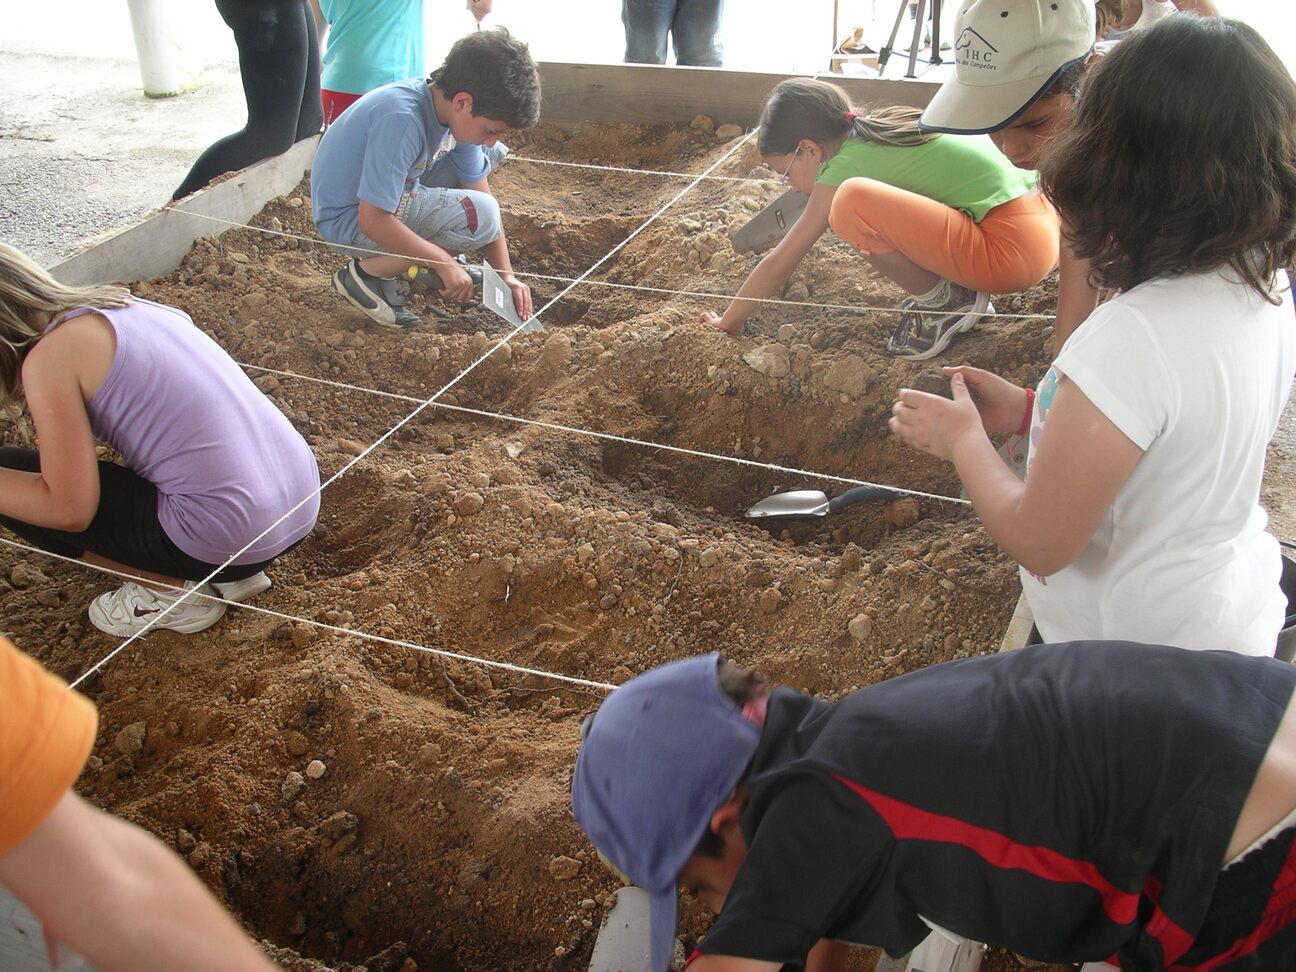 arqueologia06-2009_2010JPG